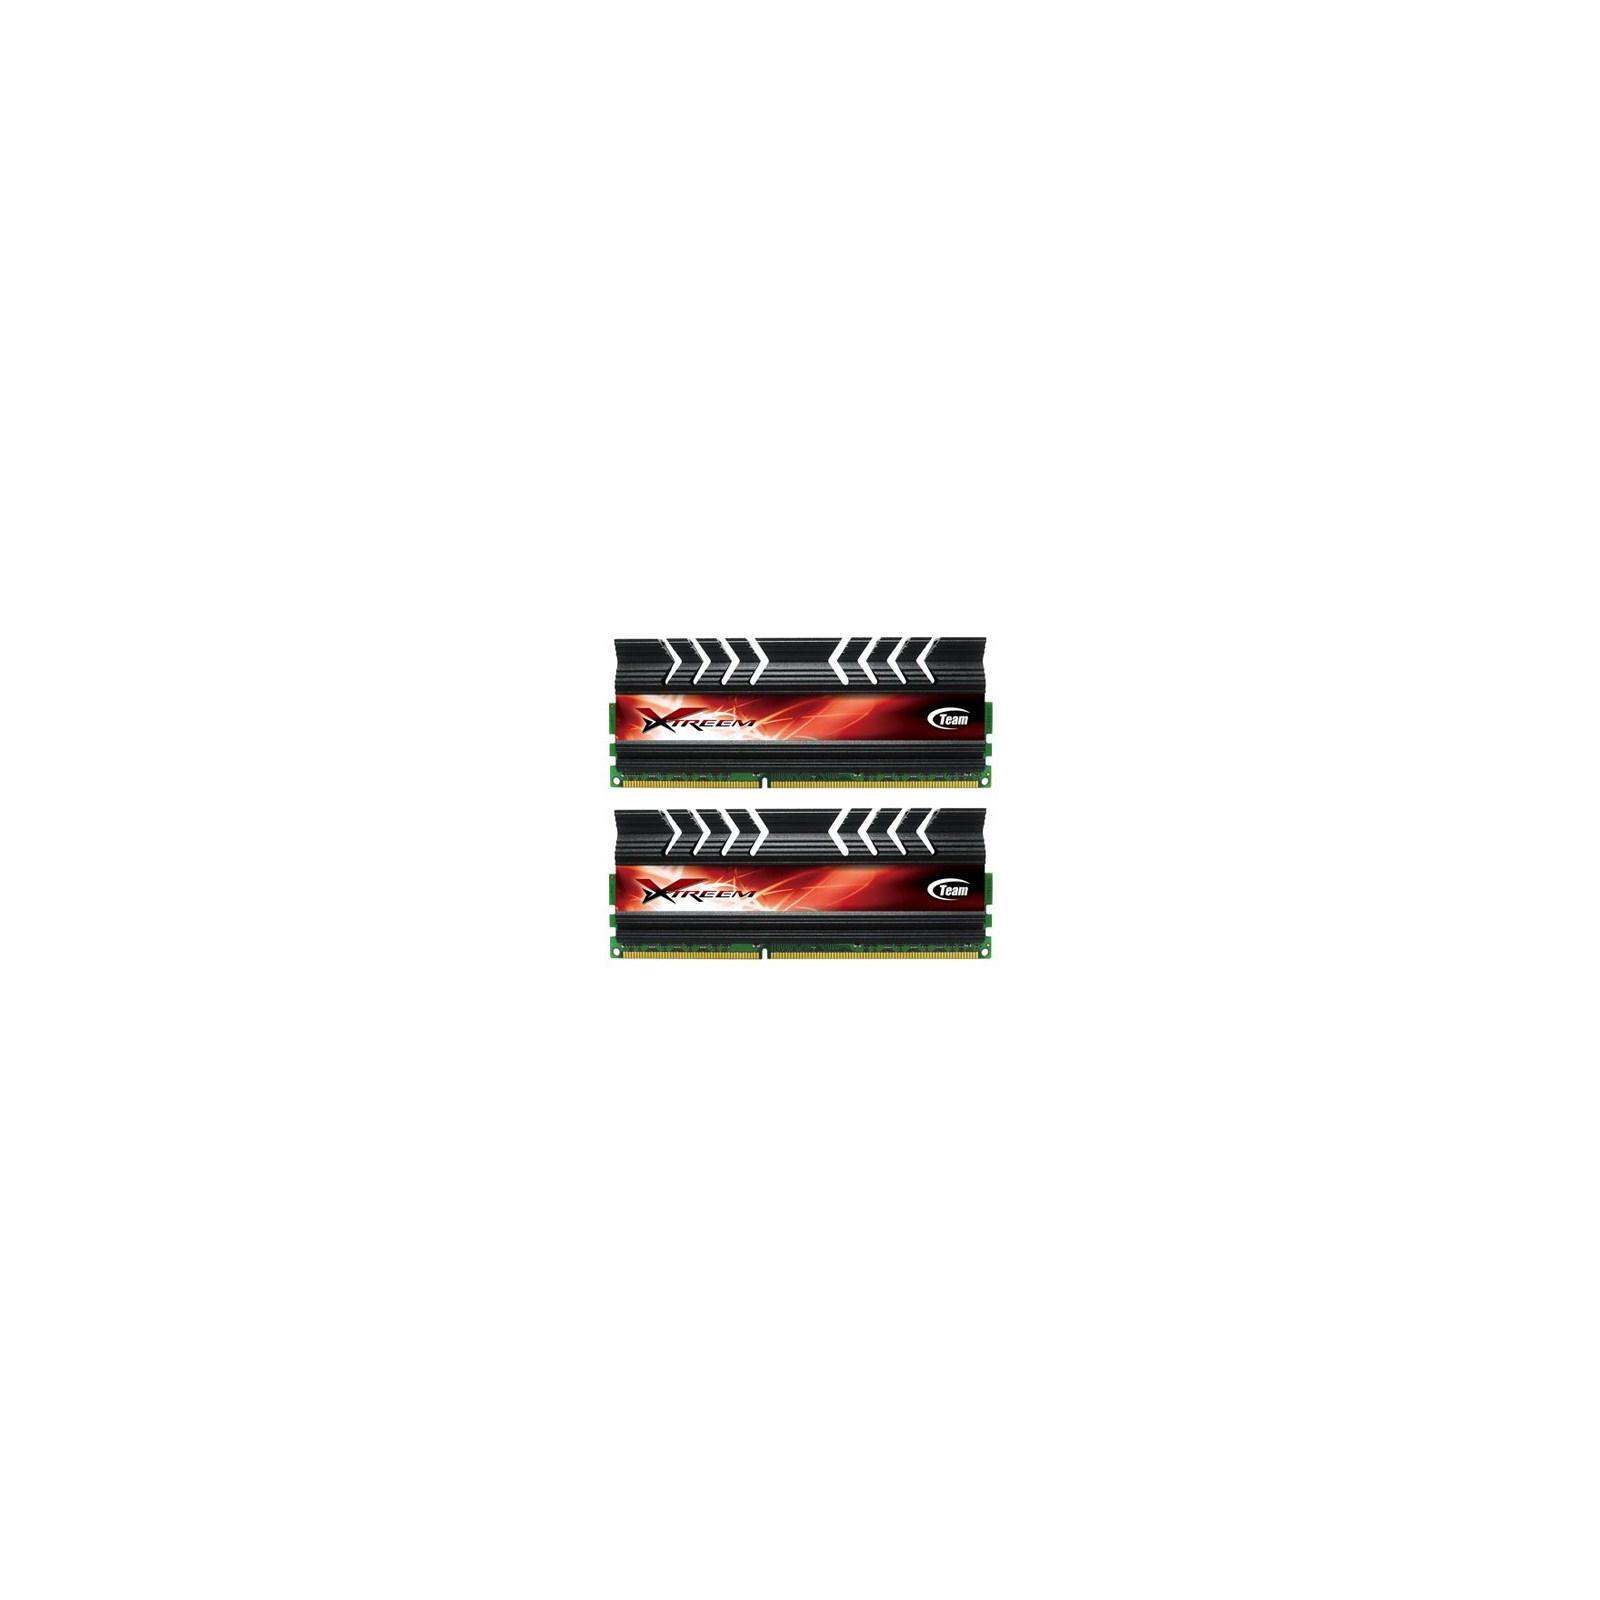 Модуль памяти для компьютера DDR3 16GB (2x8GB) 2666 MHz Team (TXD316G2666HC11CDC01)